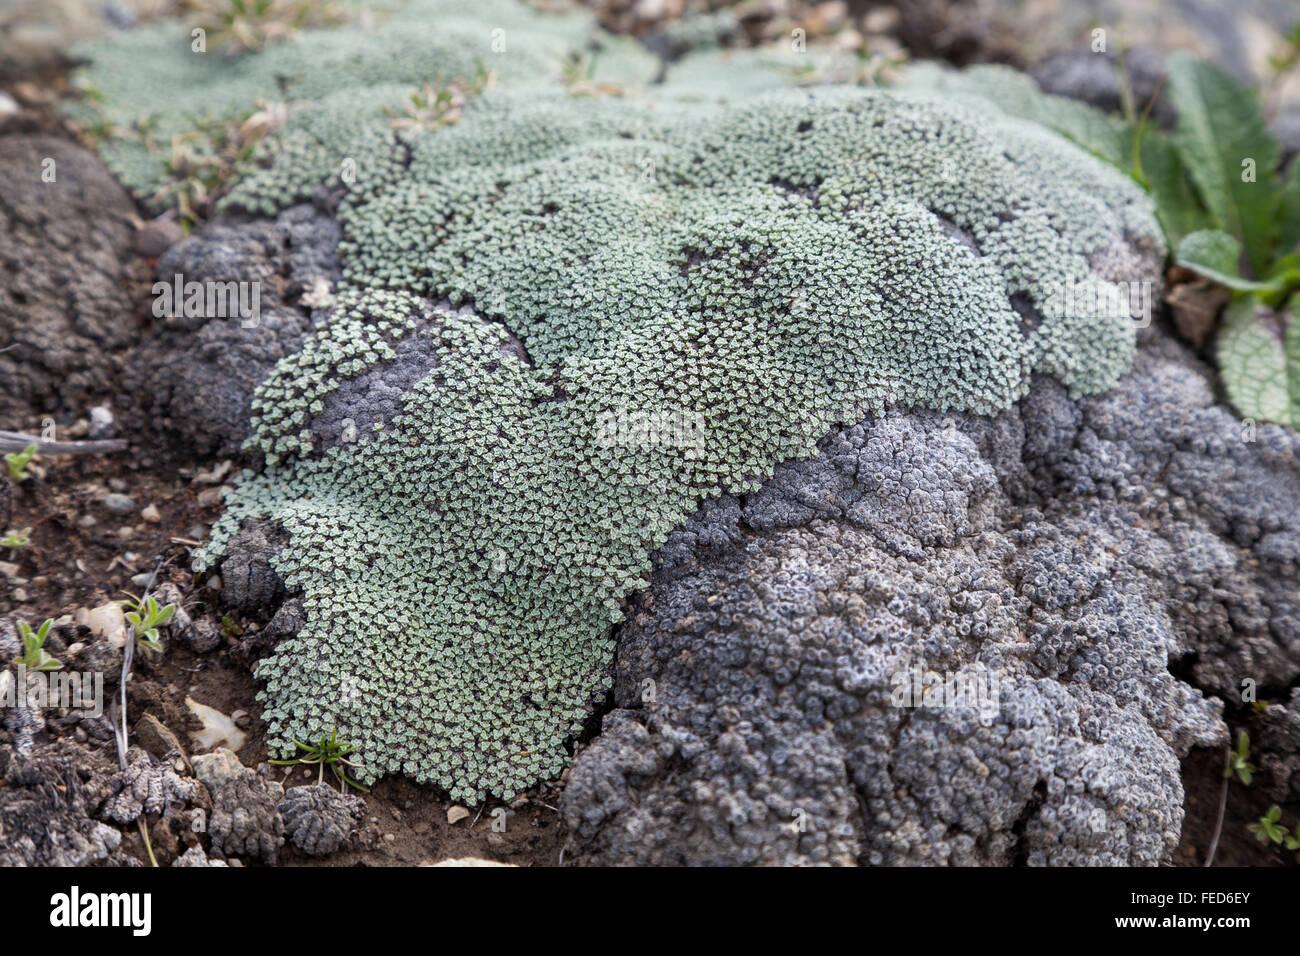 Lichen on the rocks in New Zealand rocks - Stock Image